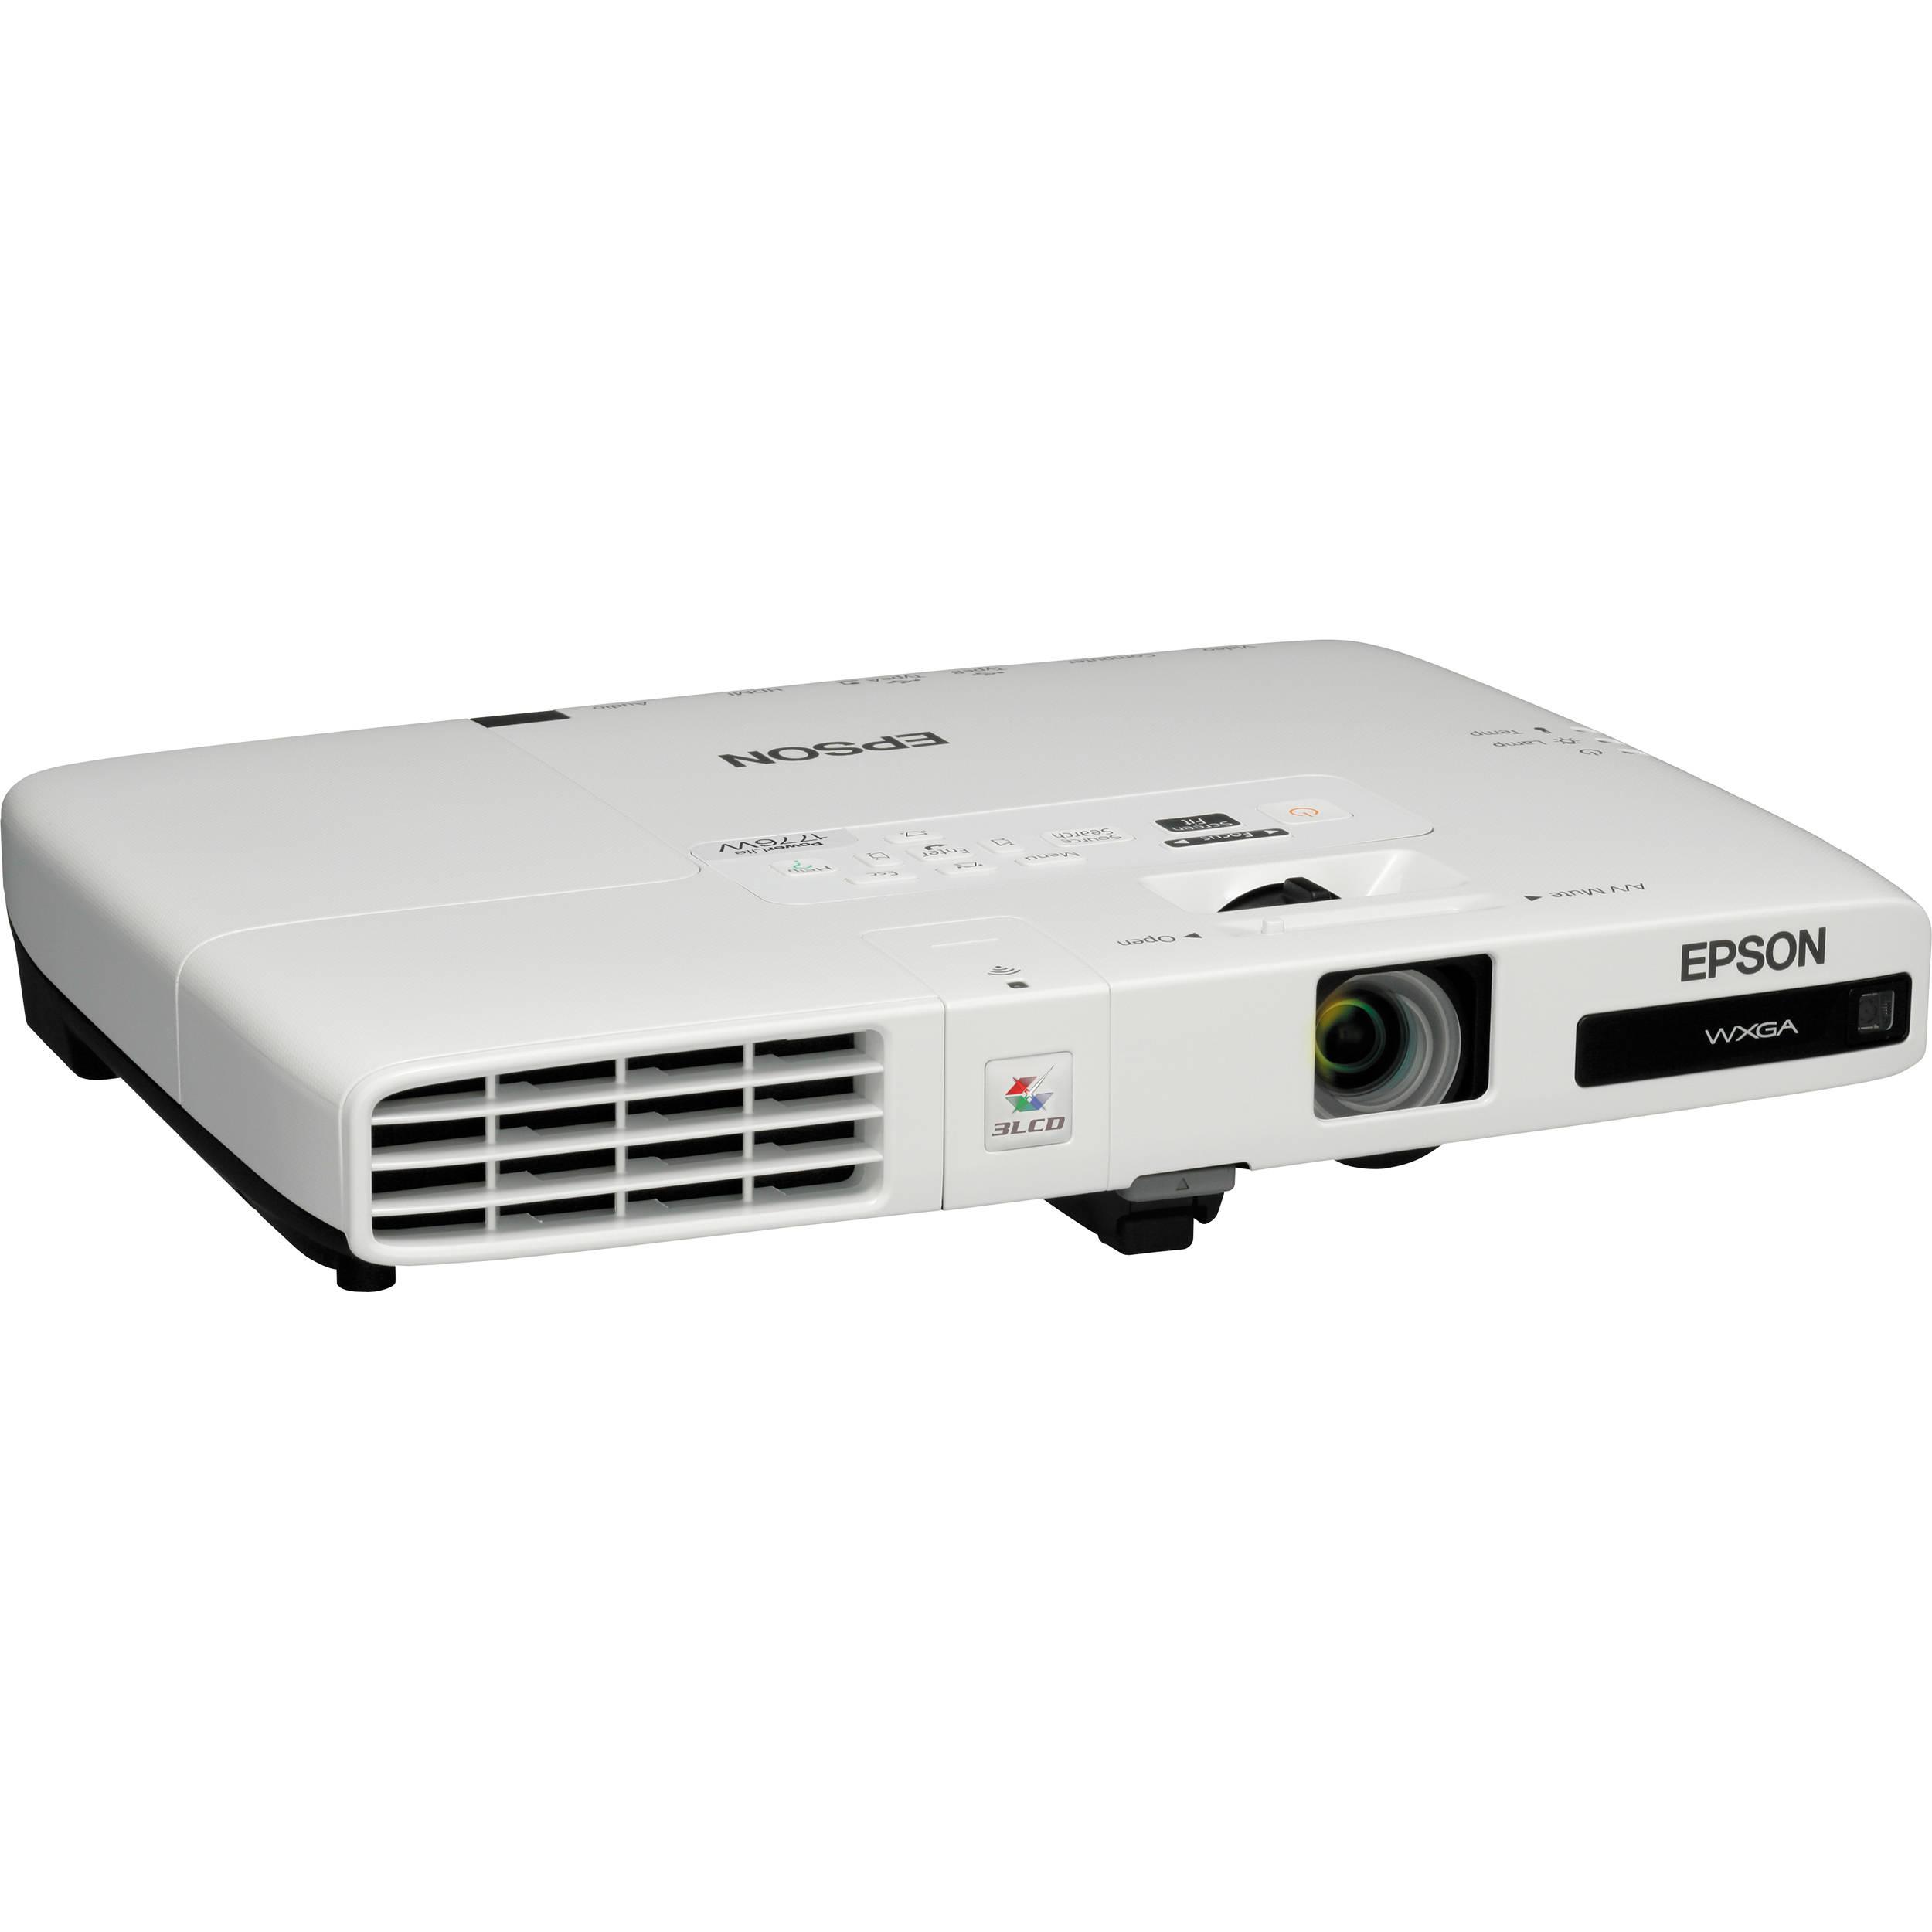 Epson PowerLite 1776W WXGA Multimedia Projector